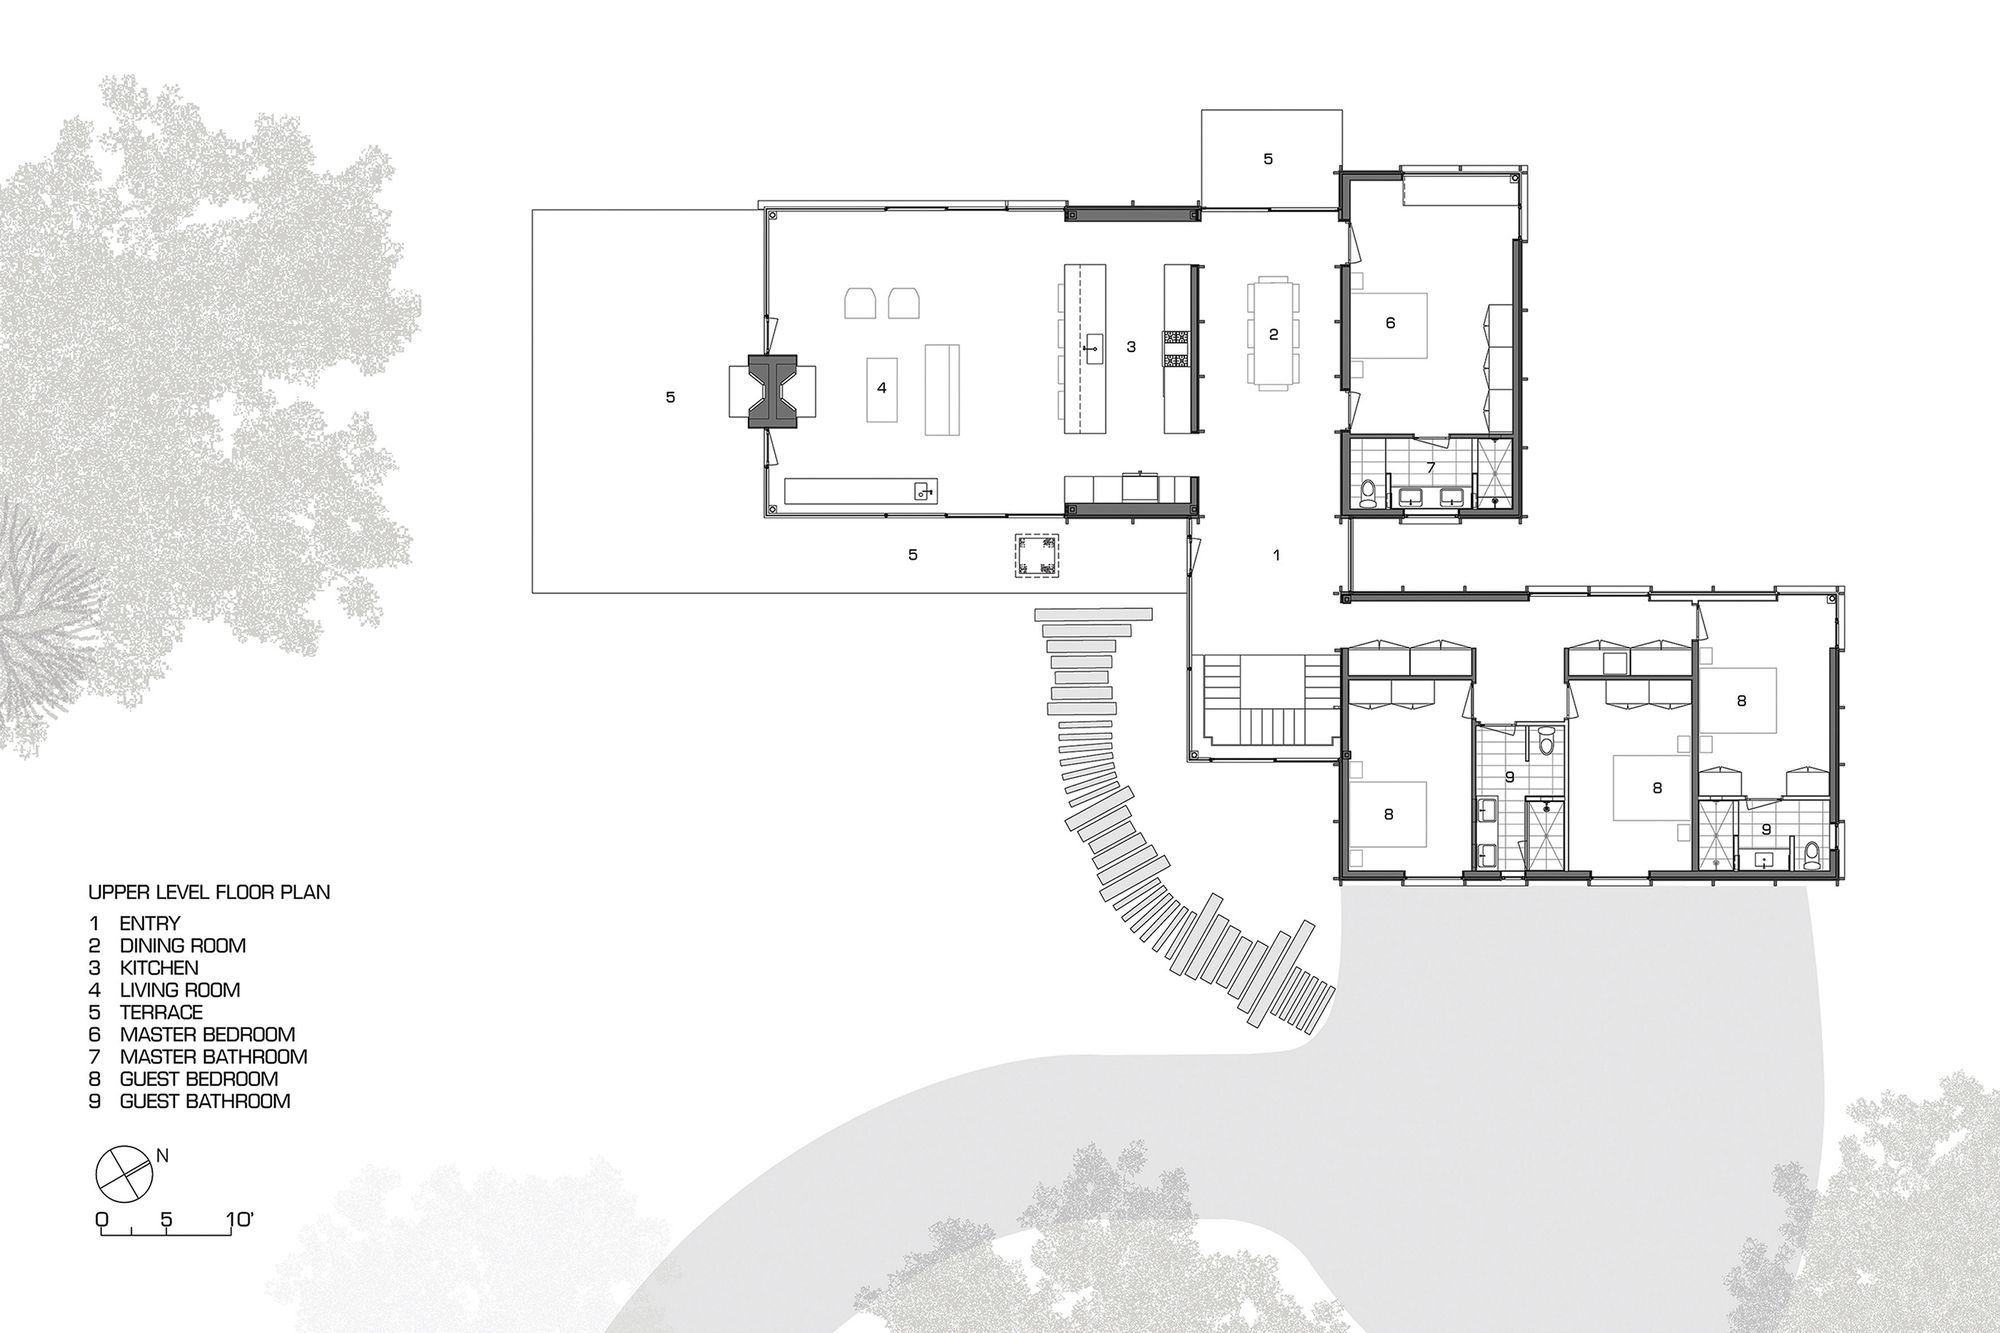 Wunderbar 82 Haus Verdrahtung Schaltplan Bild Ideen Fotos ...